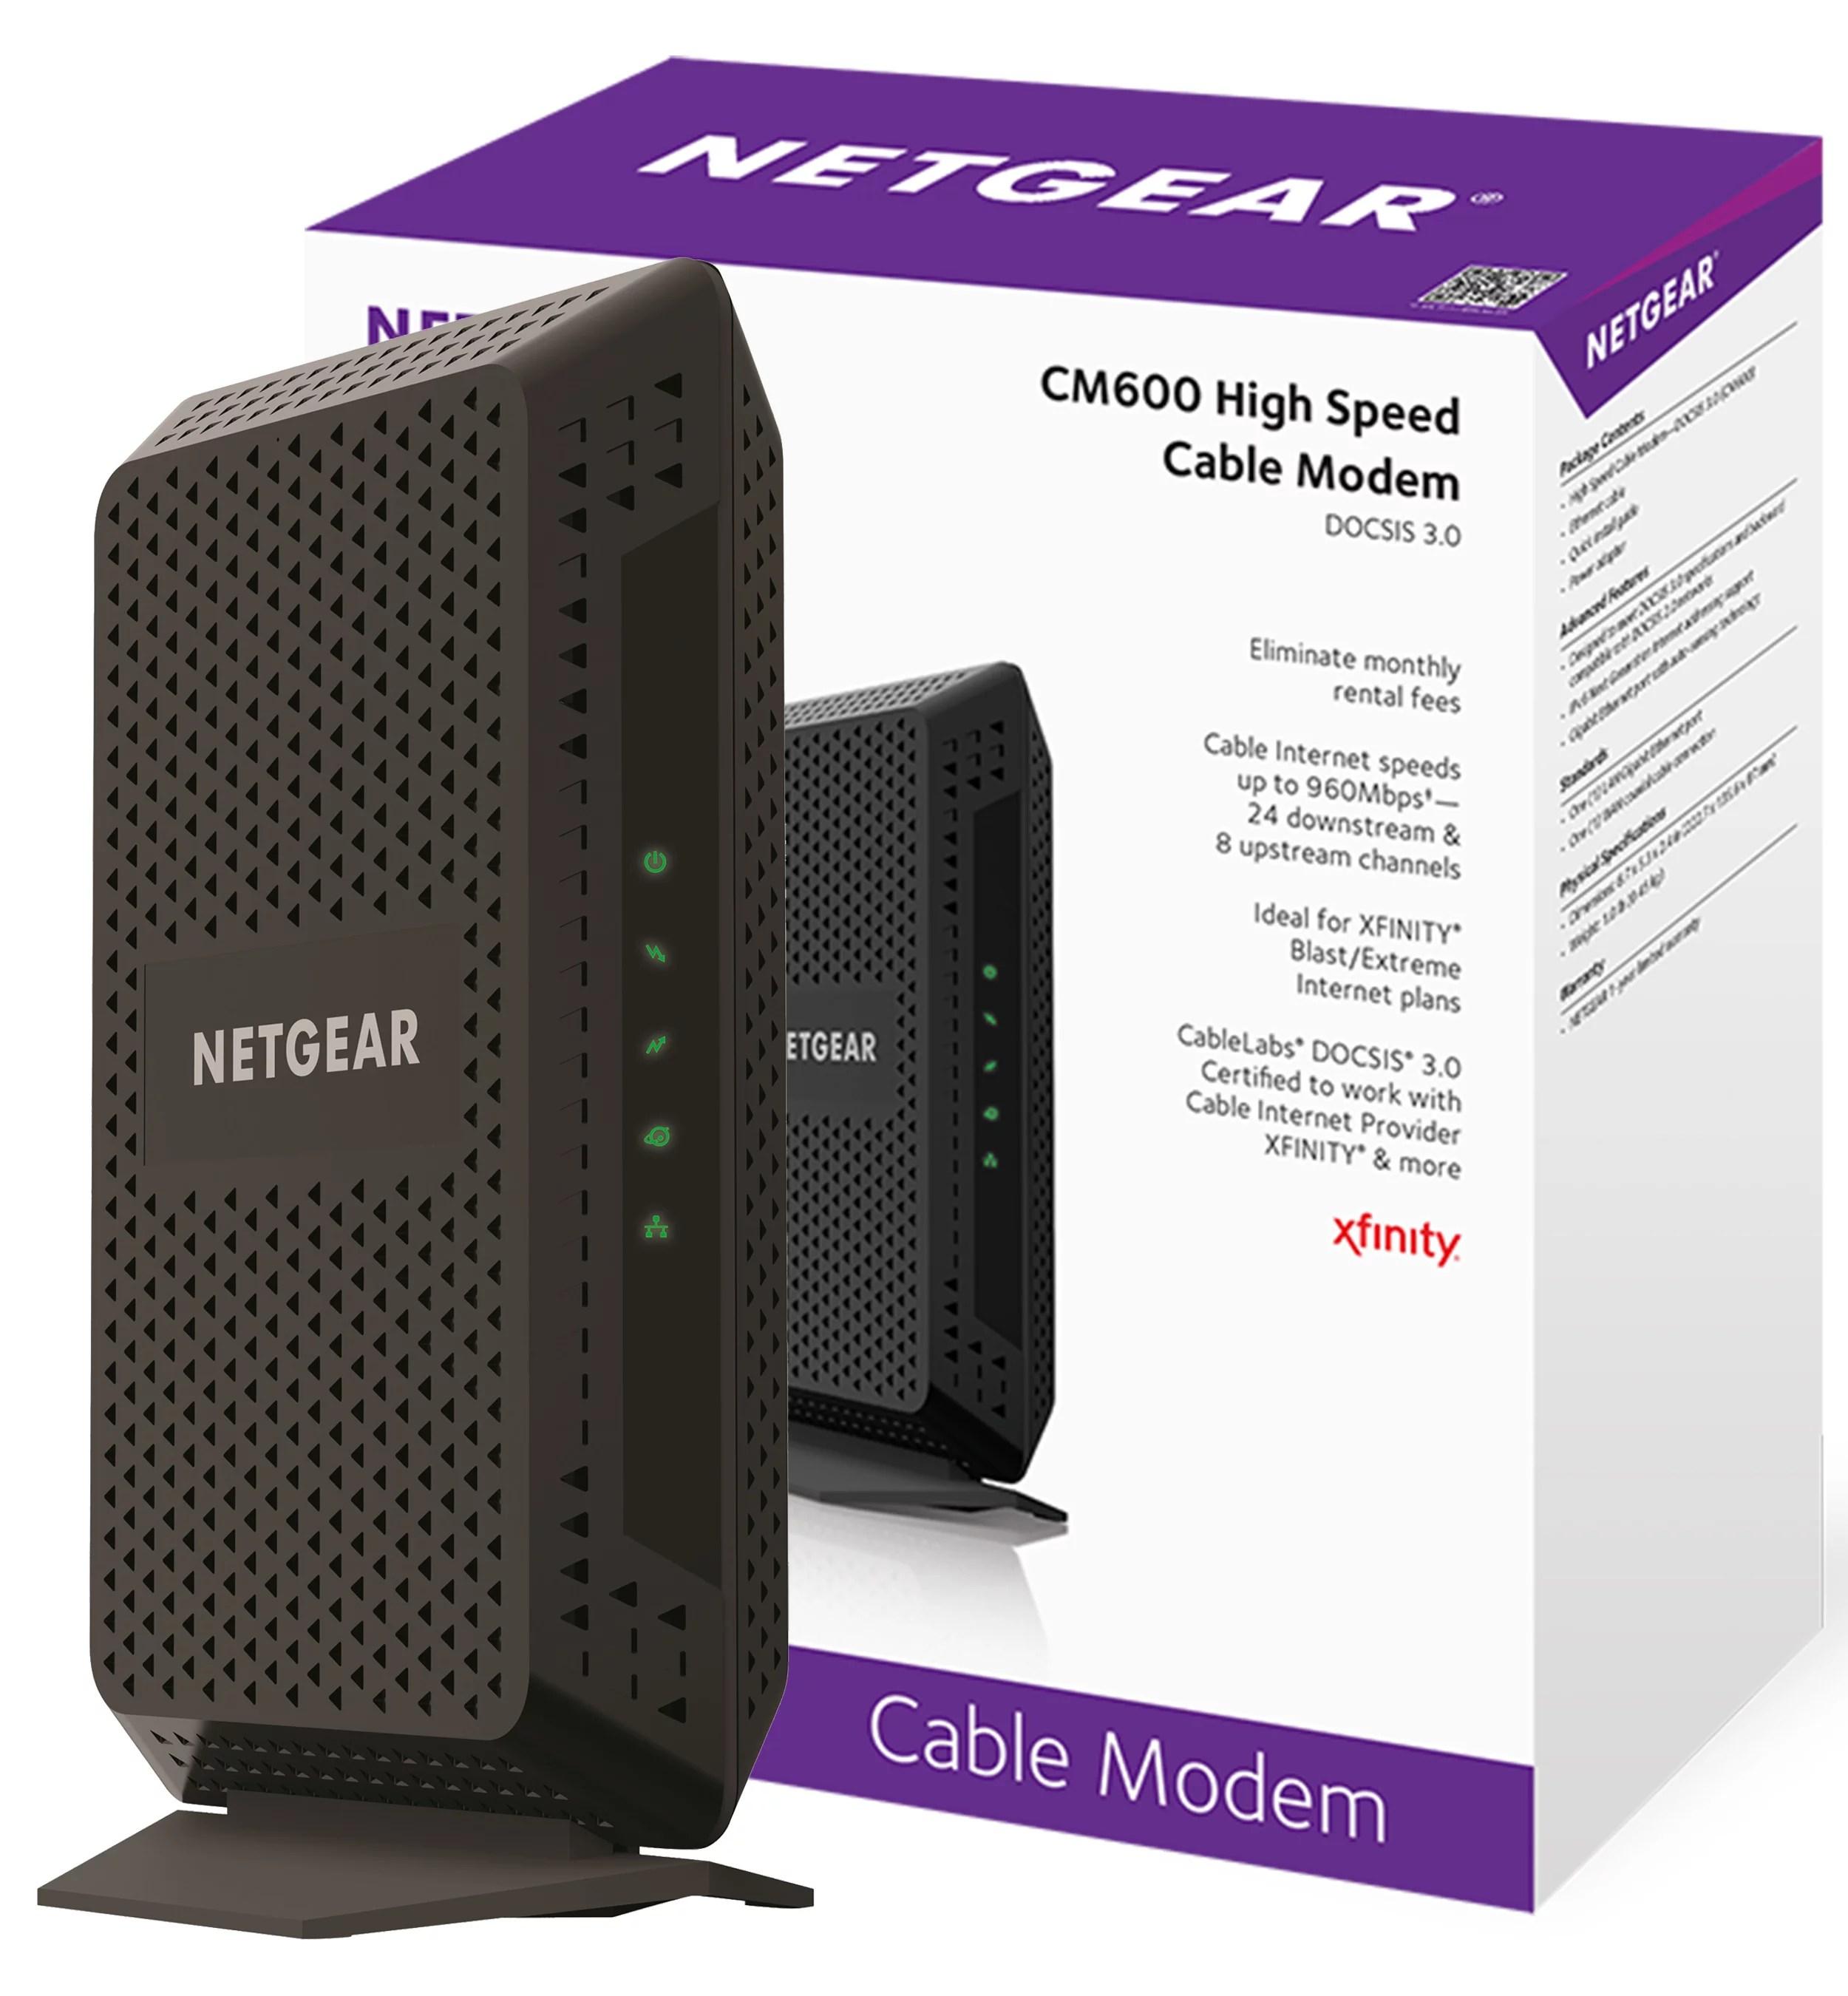 modems walmart com cable modem router diagram cleveland computer repair faq how to tell [ 2500 x 2700 Pixel ]